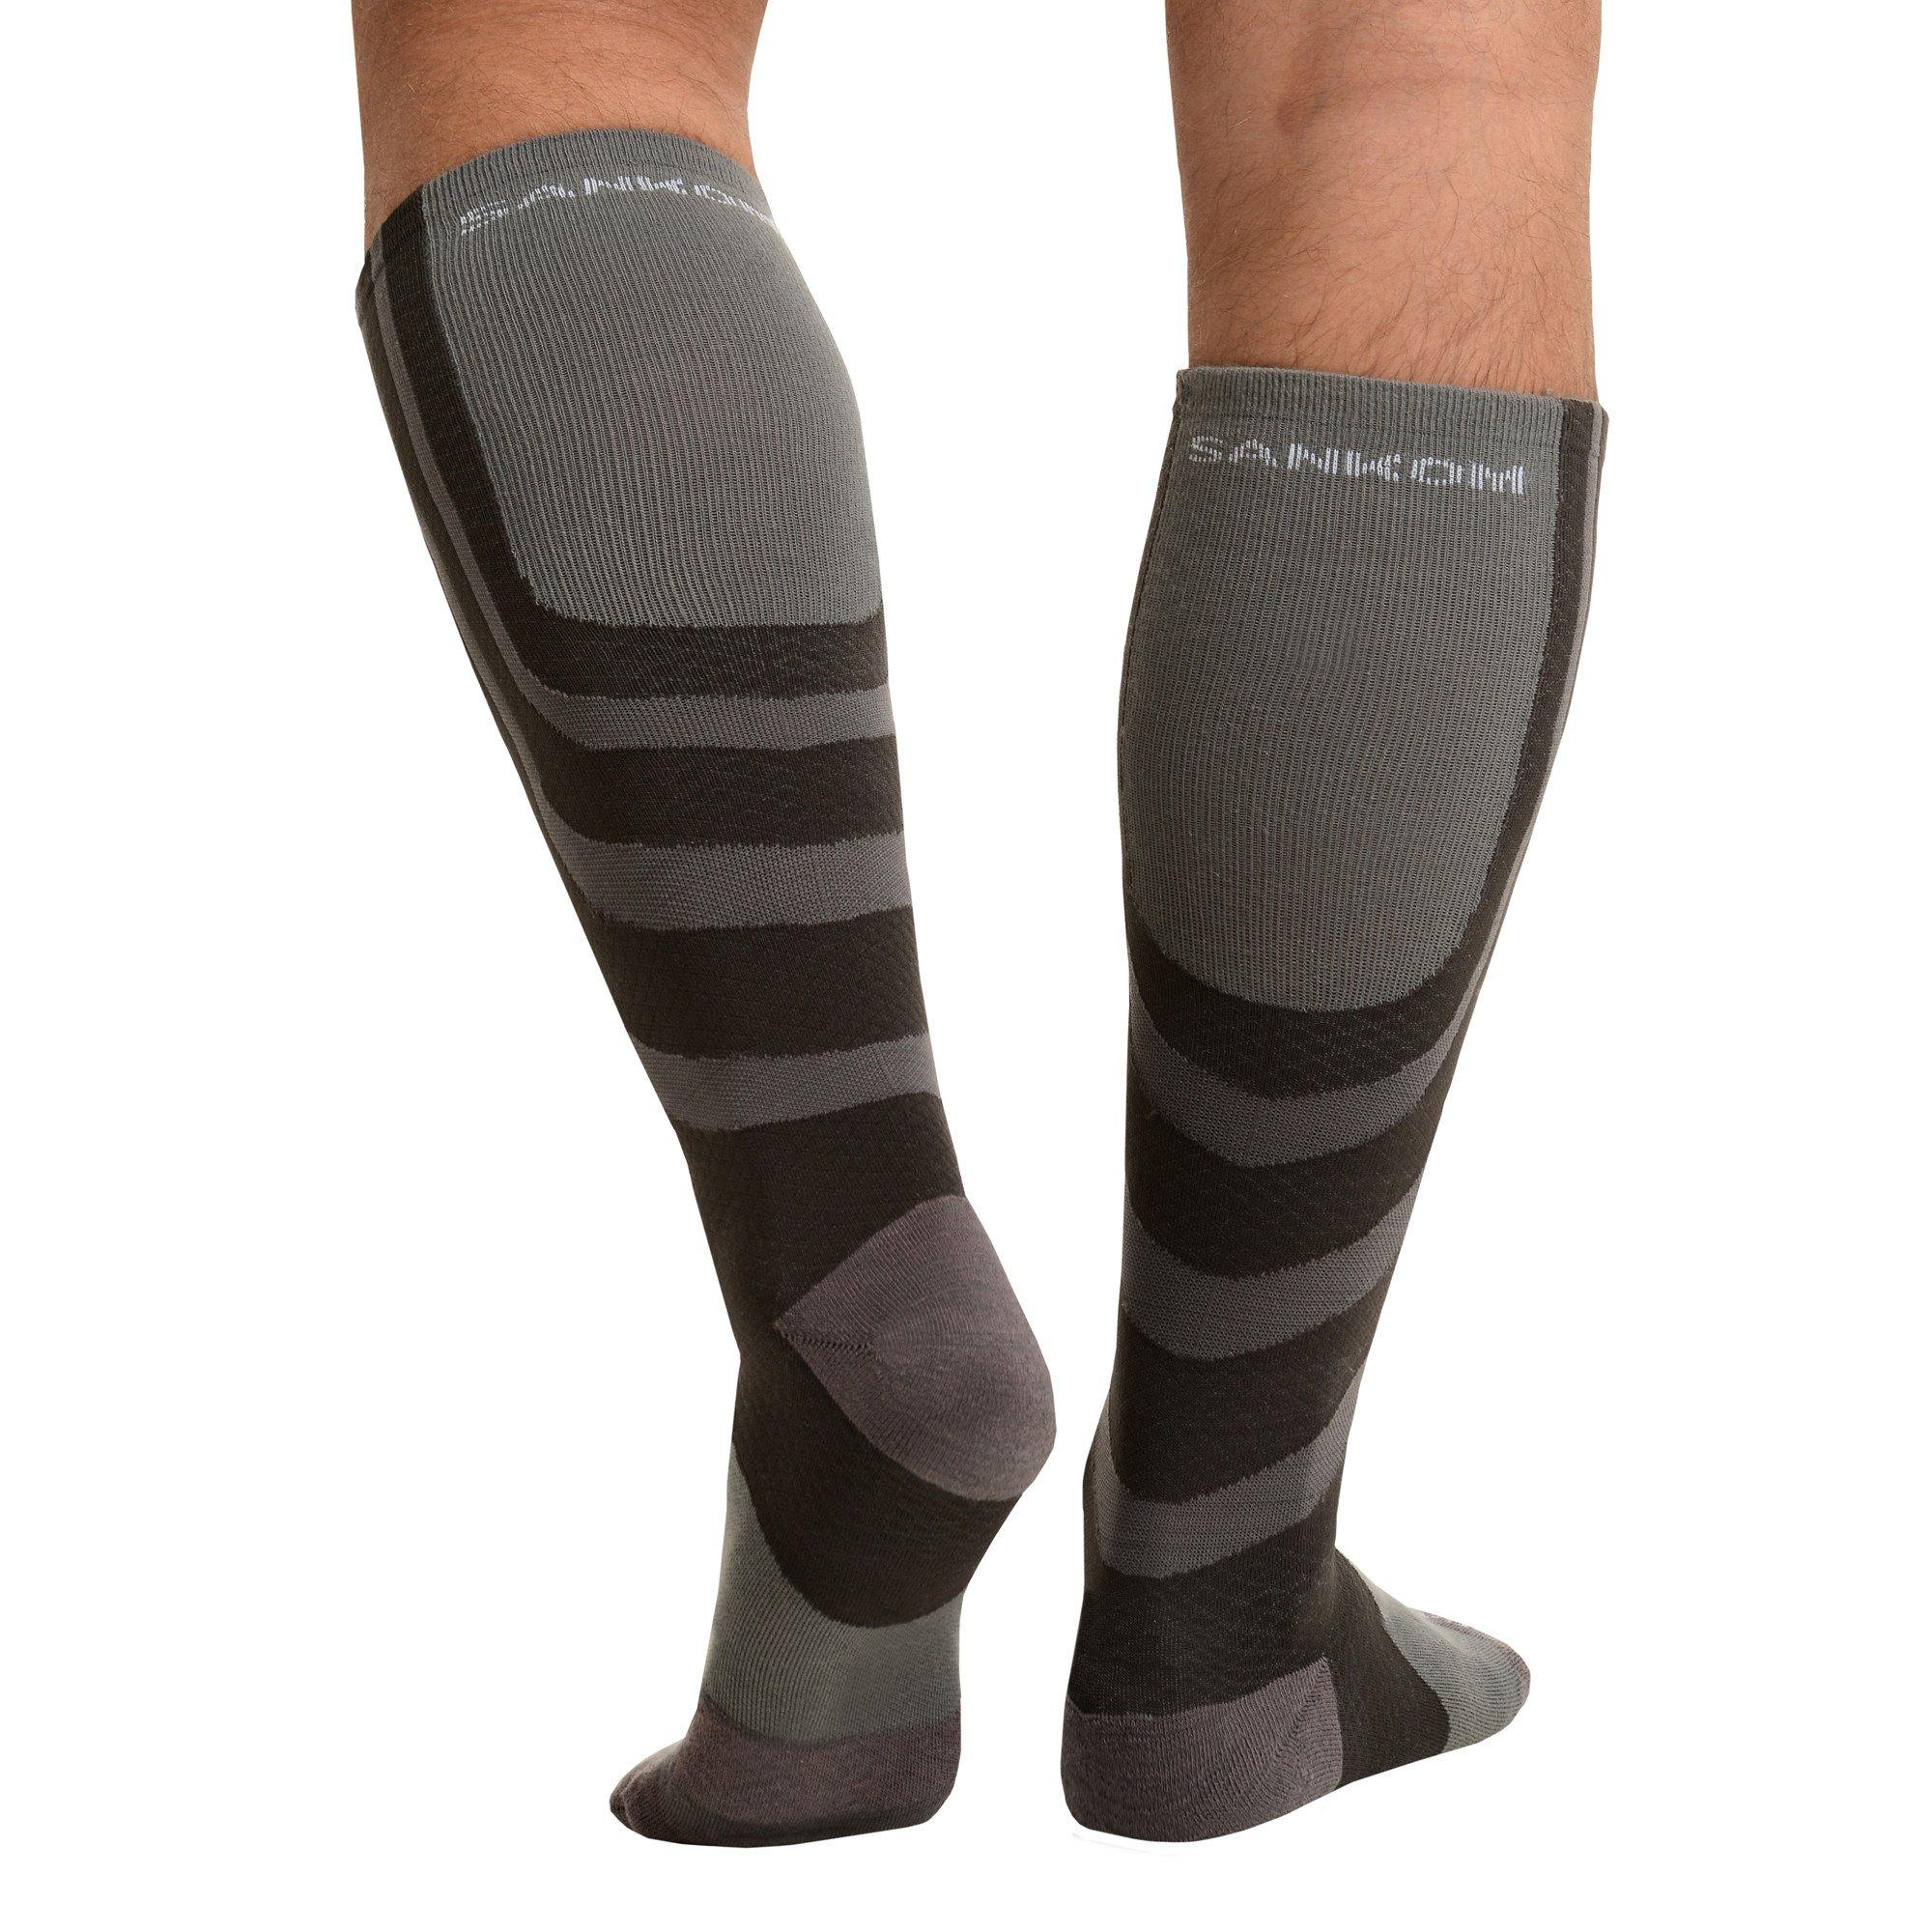 6ea230e188662 Buy Women Socks | Tights Pantyhose | Legwear |Lazada